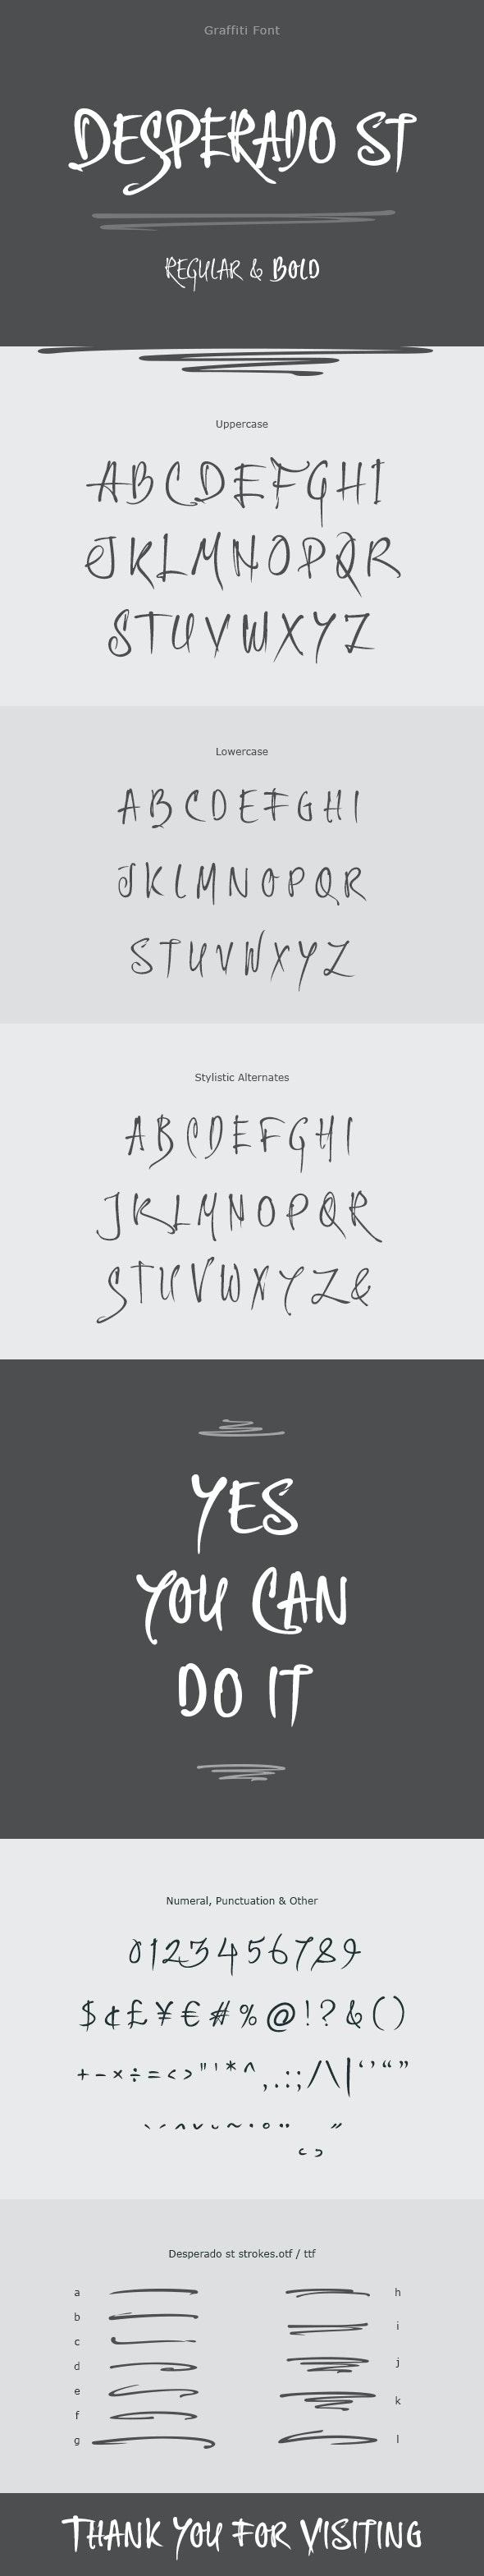 Desperado st Graffiti Font - Graffiti Fonts